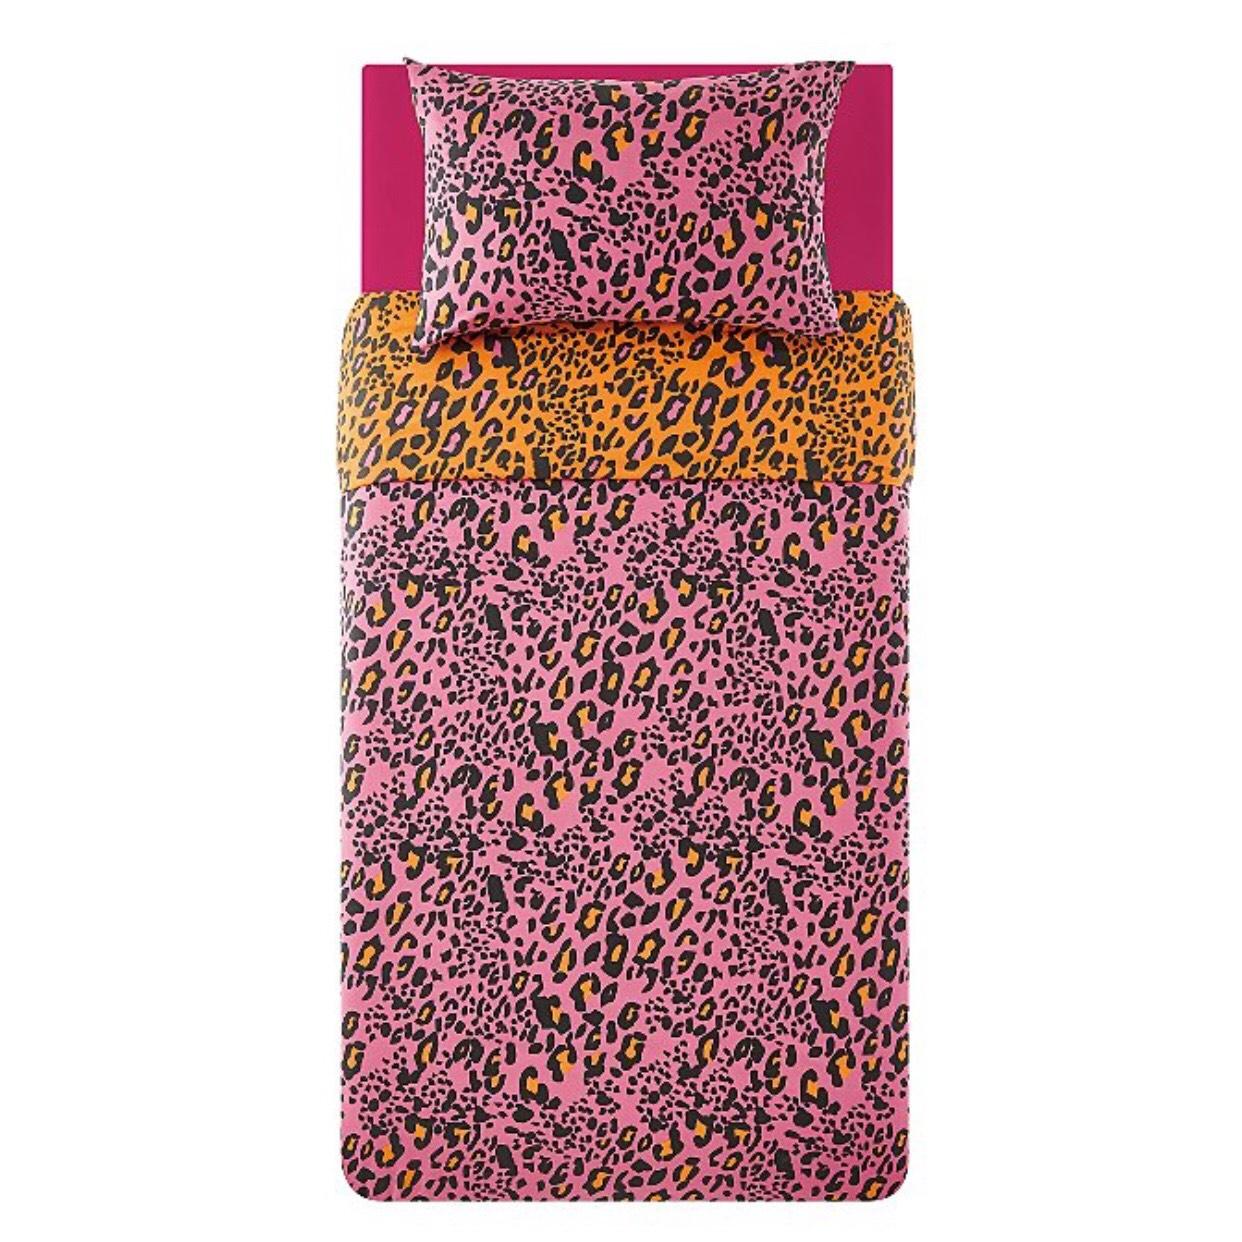 Pink leopard print single bedding £4 c&c @ Asda George